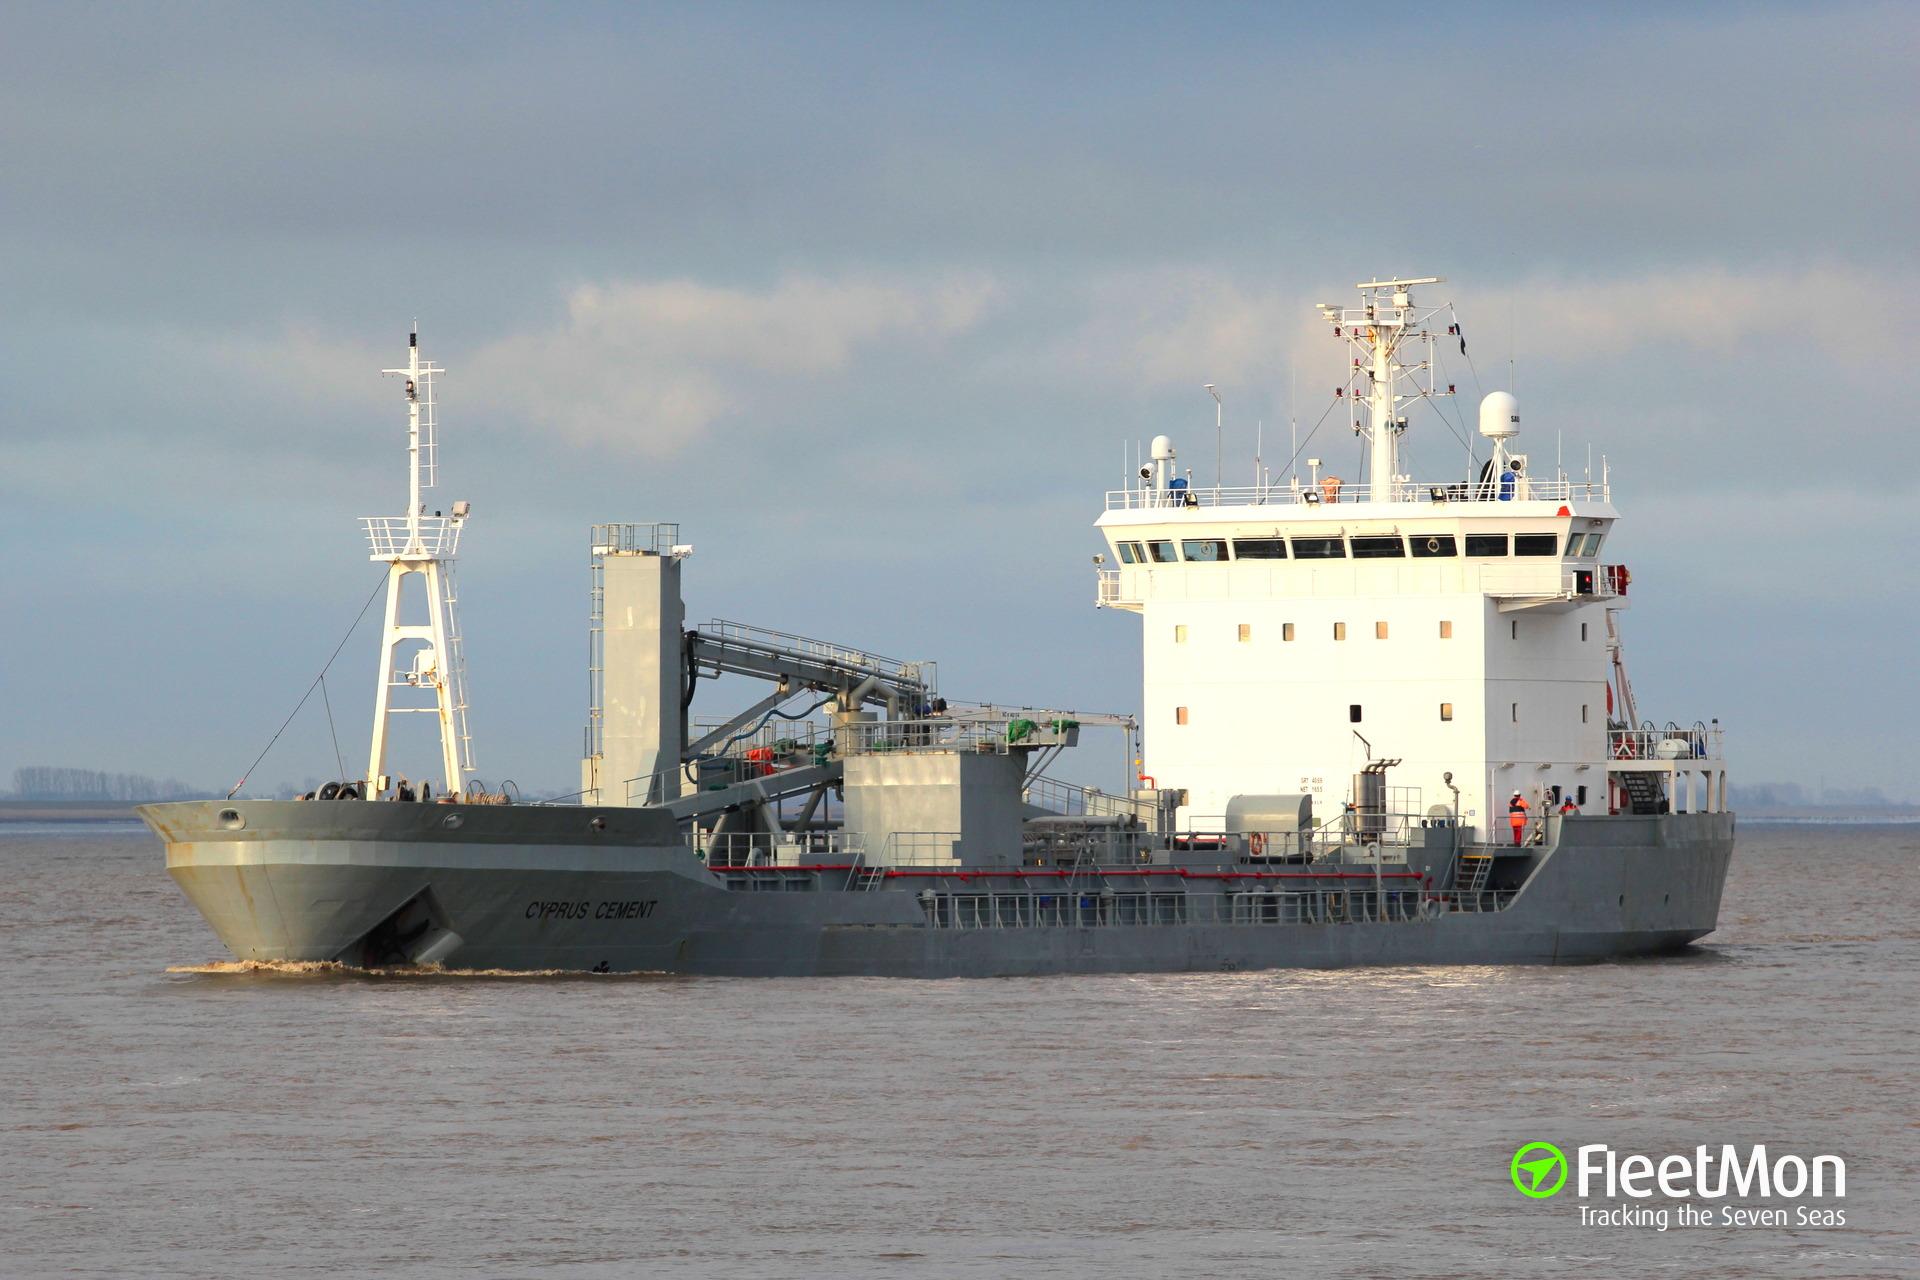 Cement carrier Cyprus Cement wreaked havoc in Levanger marina, Norway